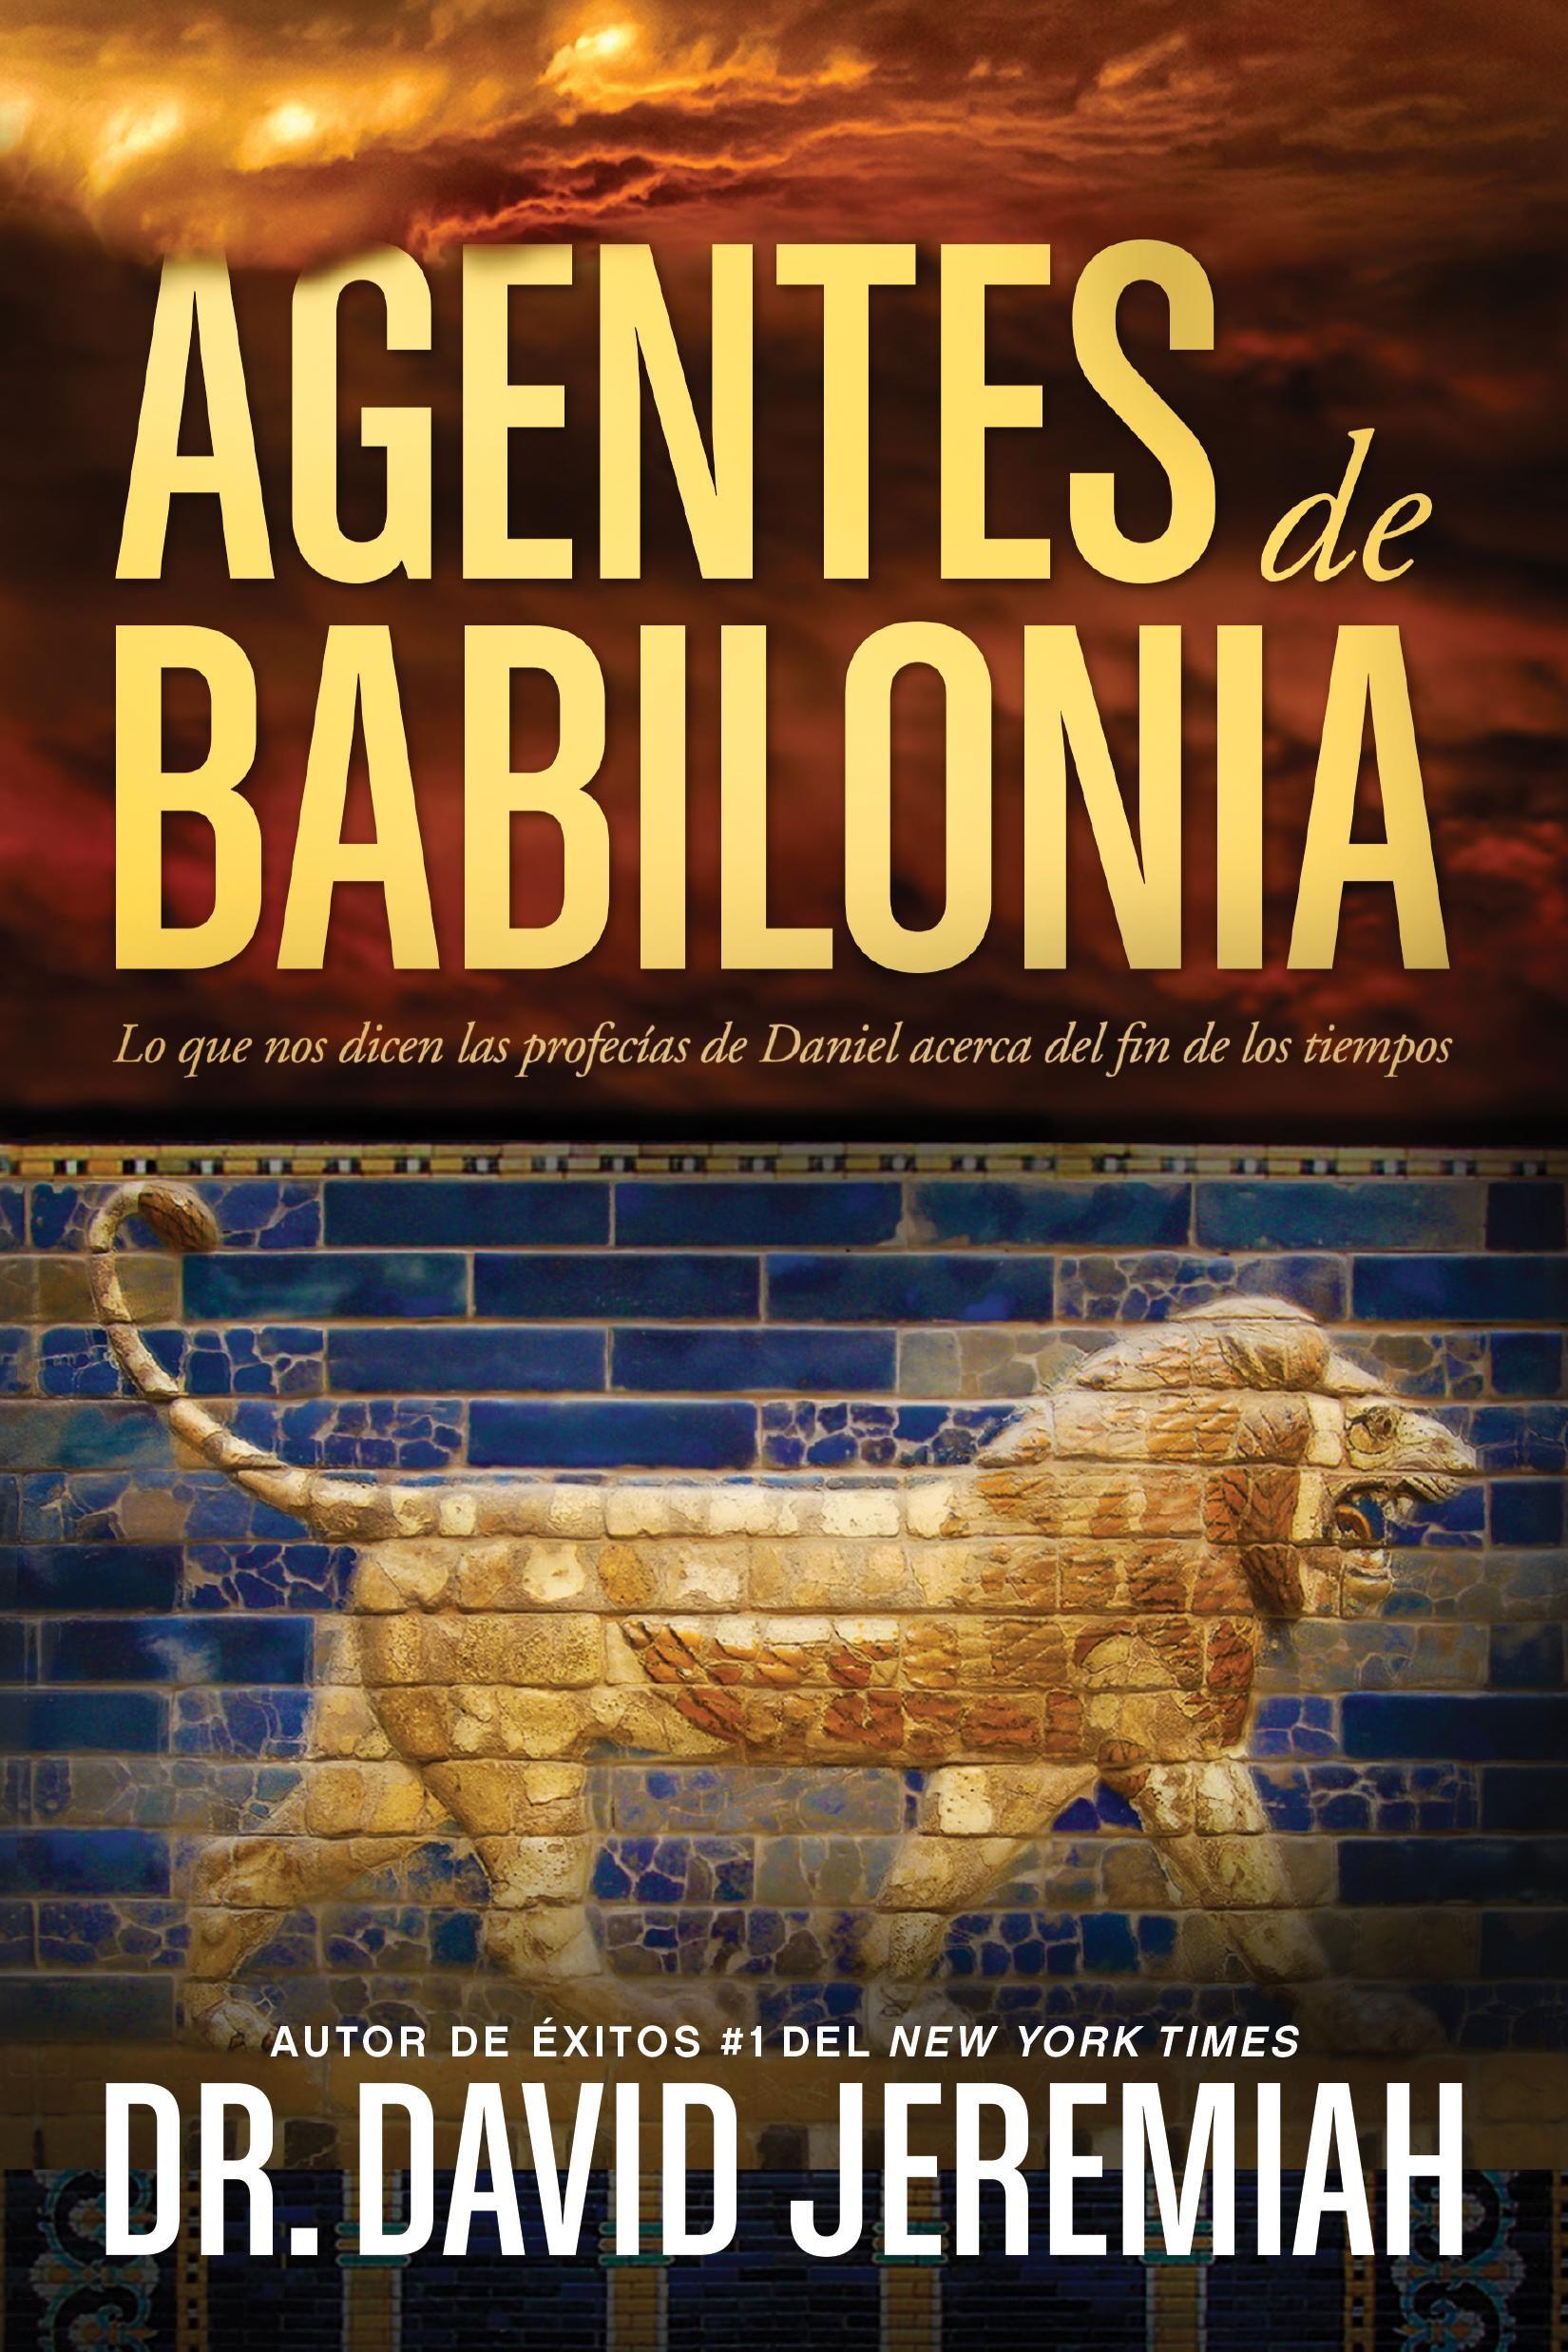 Agentes de Babilonia: Agents of Babylon